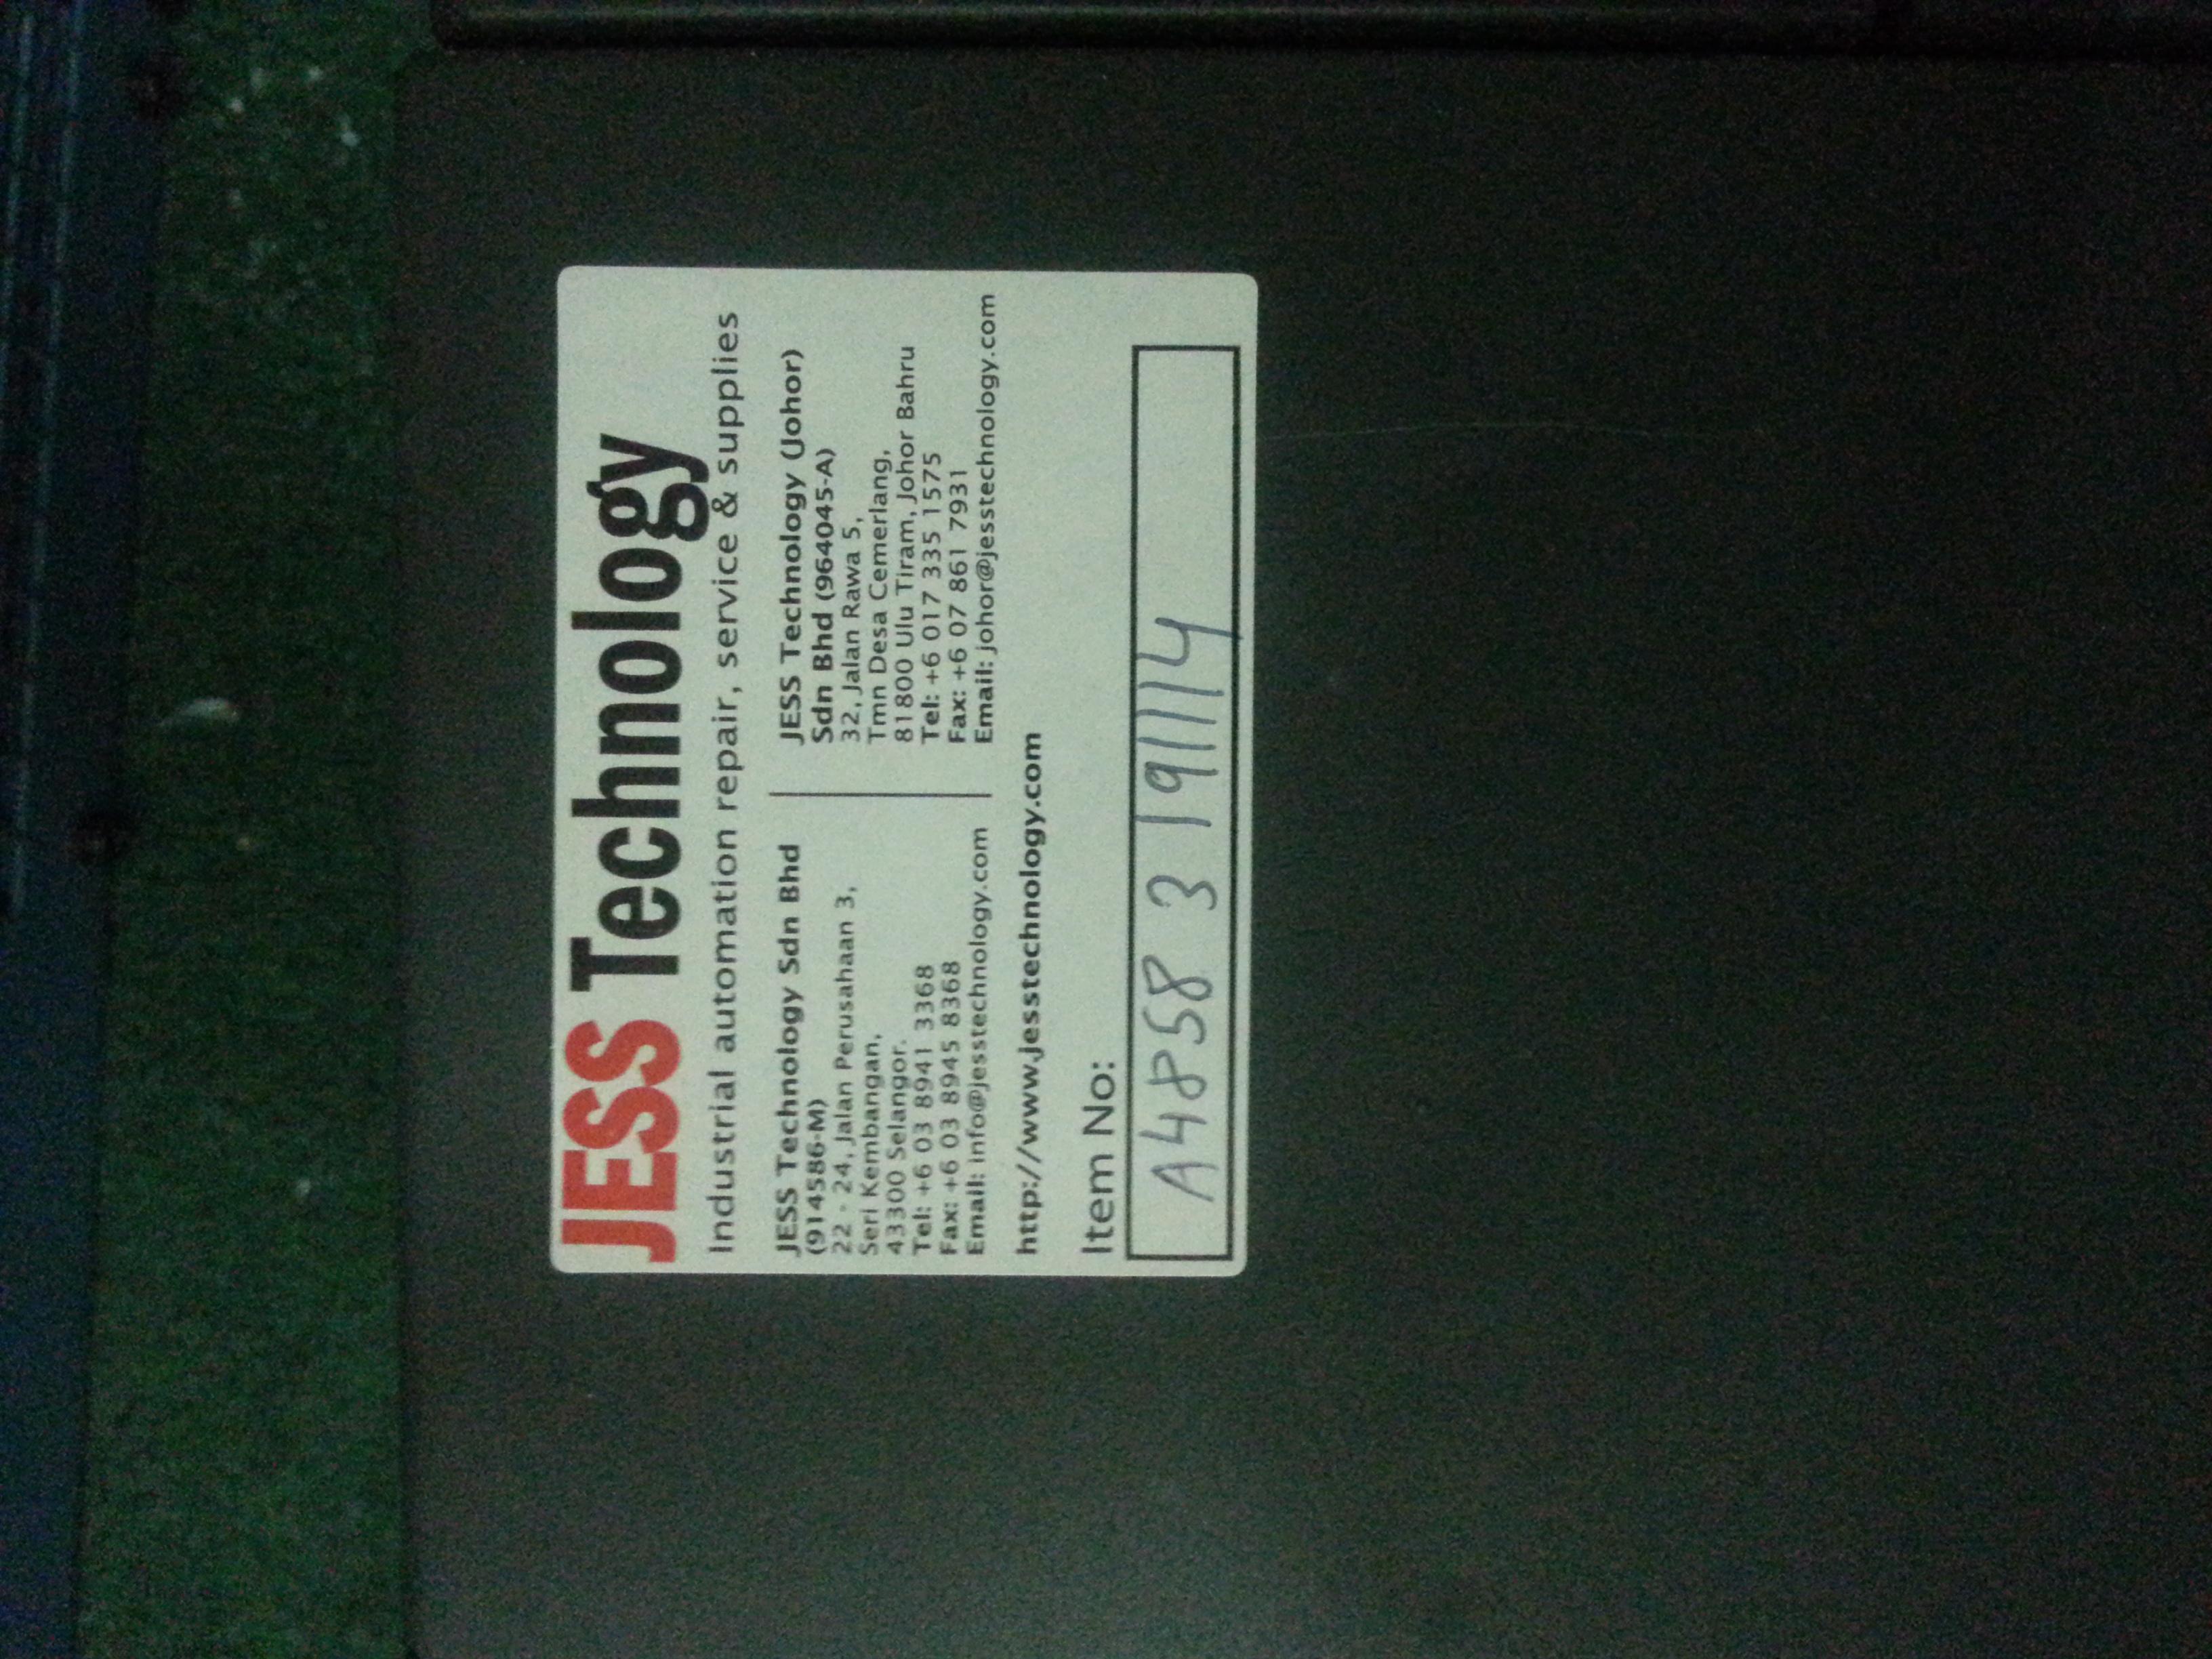 Repair 6SE6440-2UD31-5DA1 SIEMENS SIEMENS MICROMASTER 440 in Malaysia, Singapore, Thailand, Indonesia